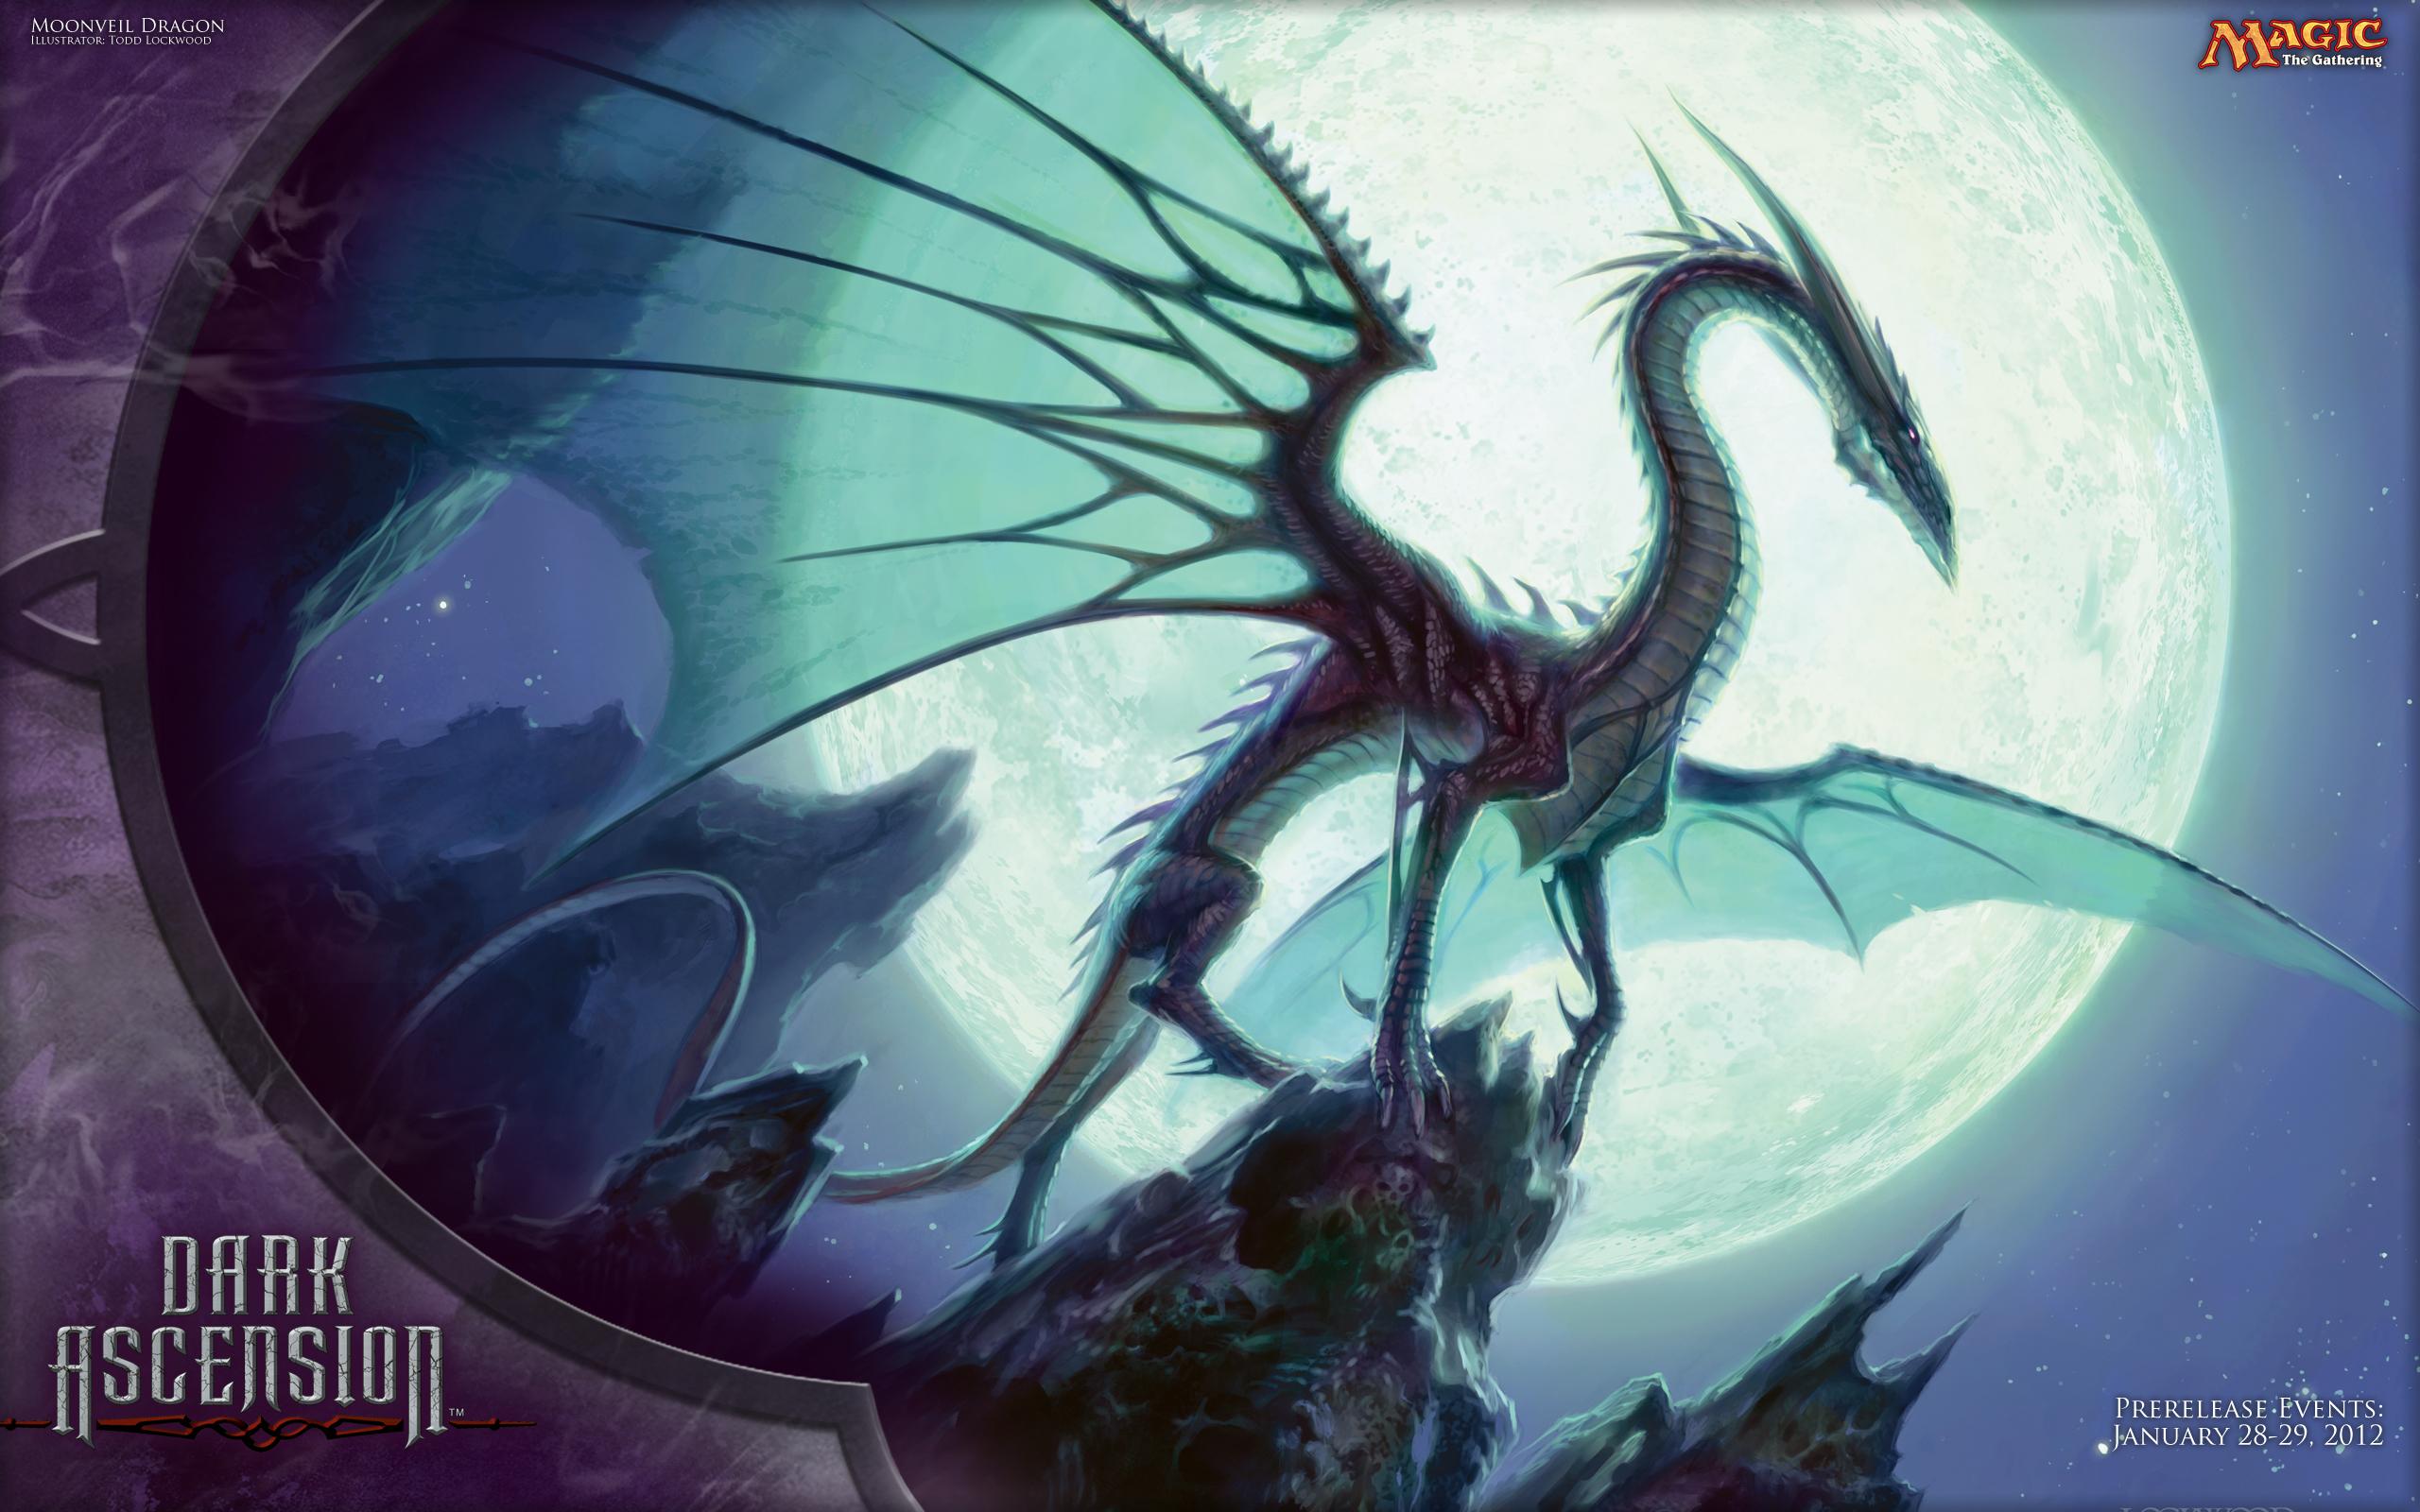 image The magic of dragons part 2 straight furry yiff gorilka mlp sfm